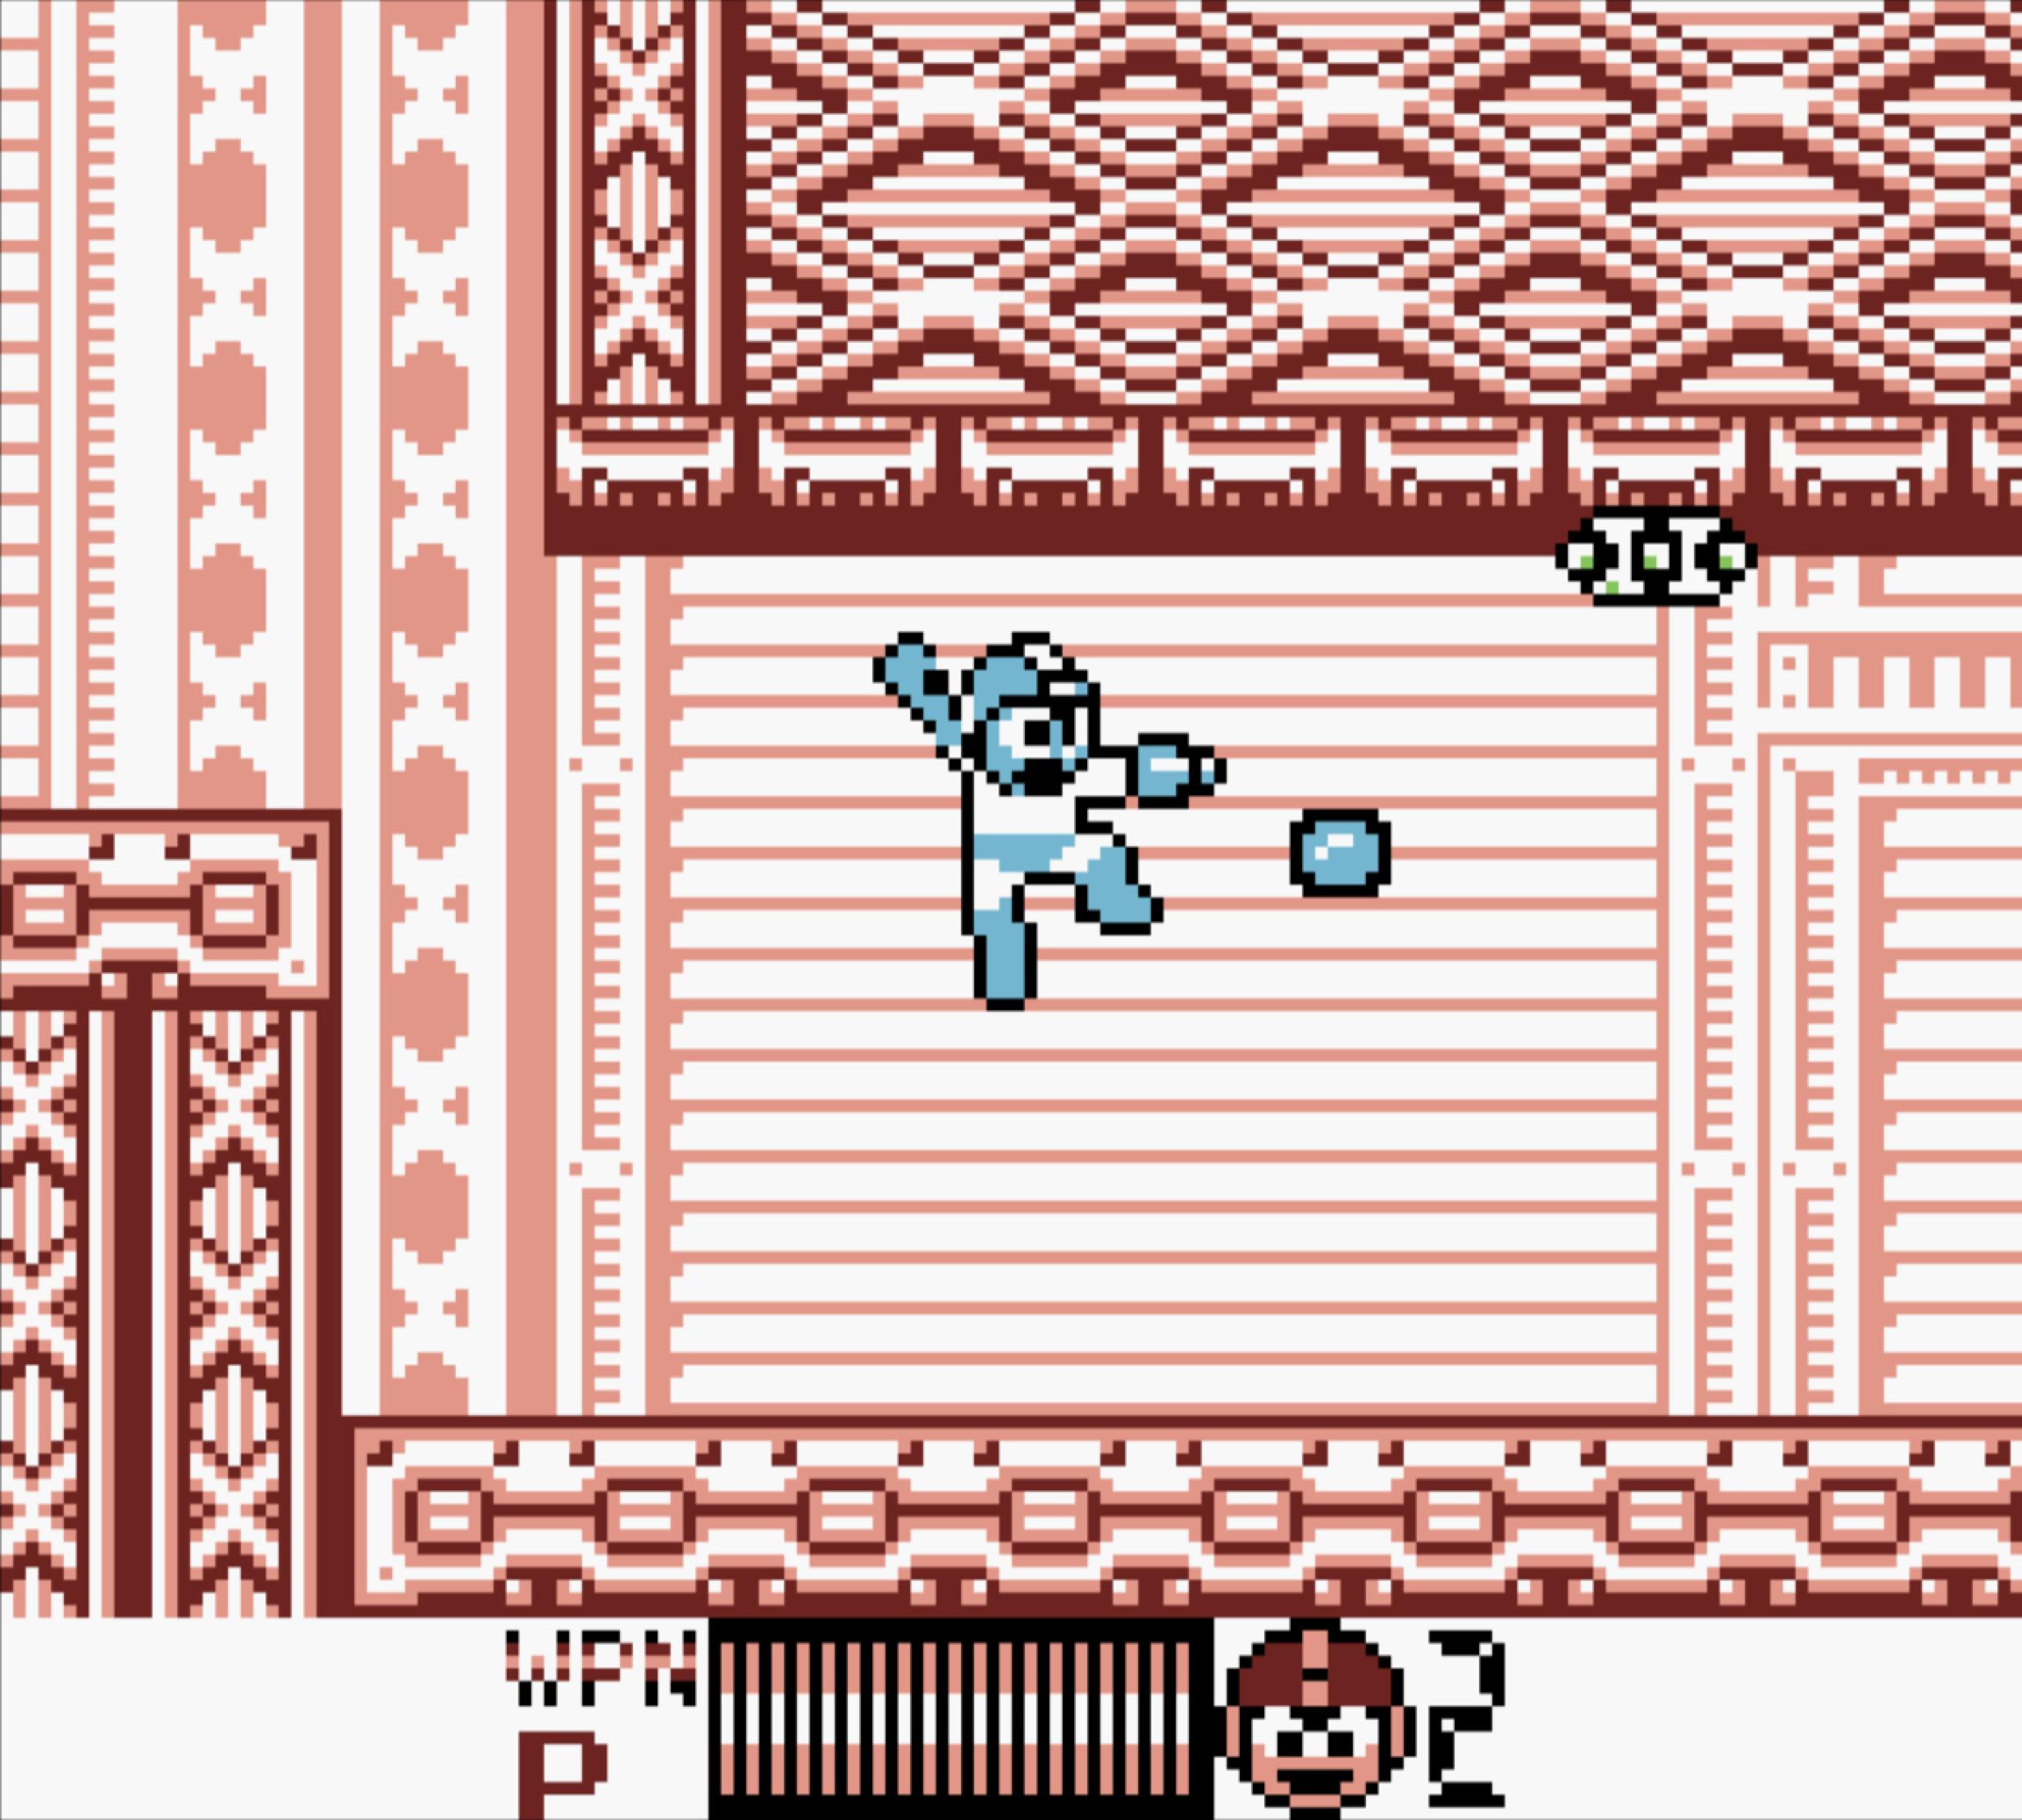 Mega Man Dr. Wily's Revenge 2018-09-22 17.10.26.png